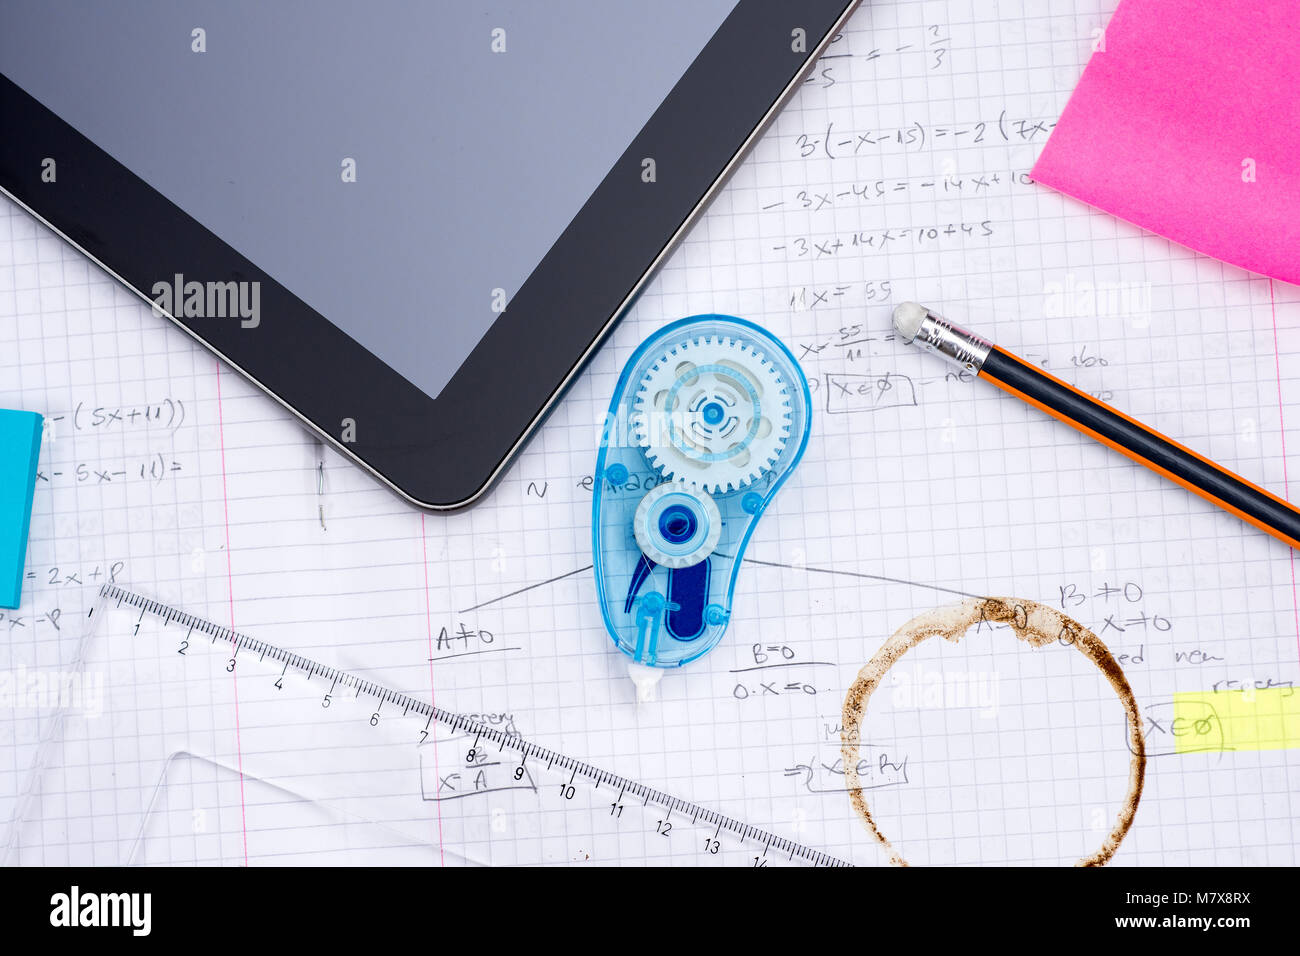 Digitale Tablet, Bleistift, Lineal über Blatt Papier mit ...